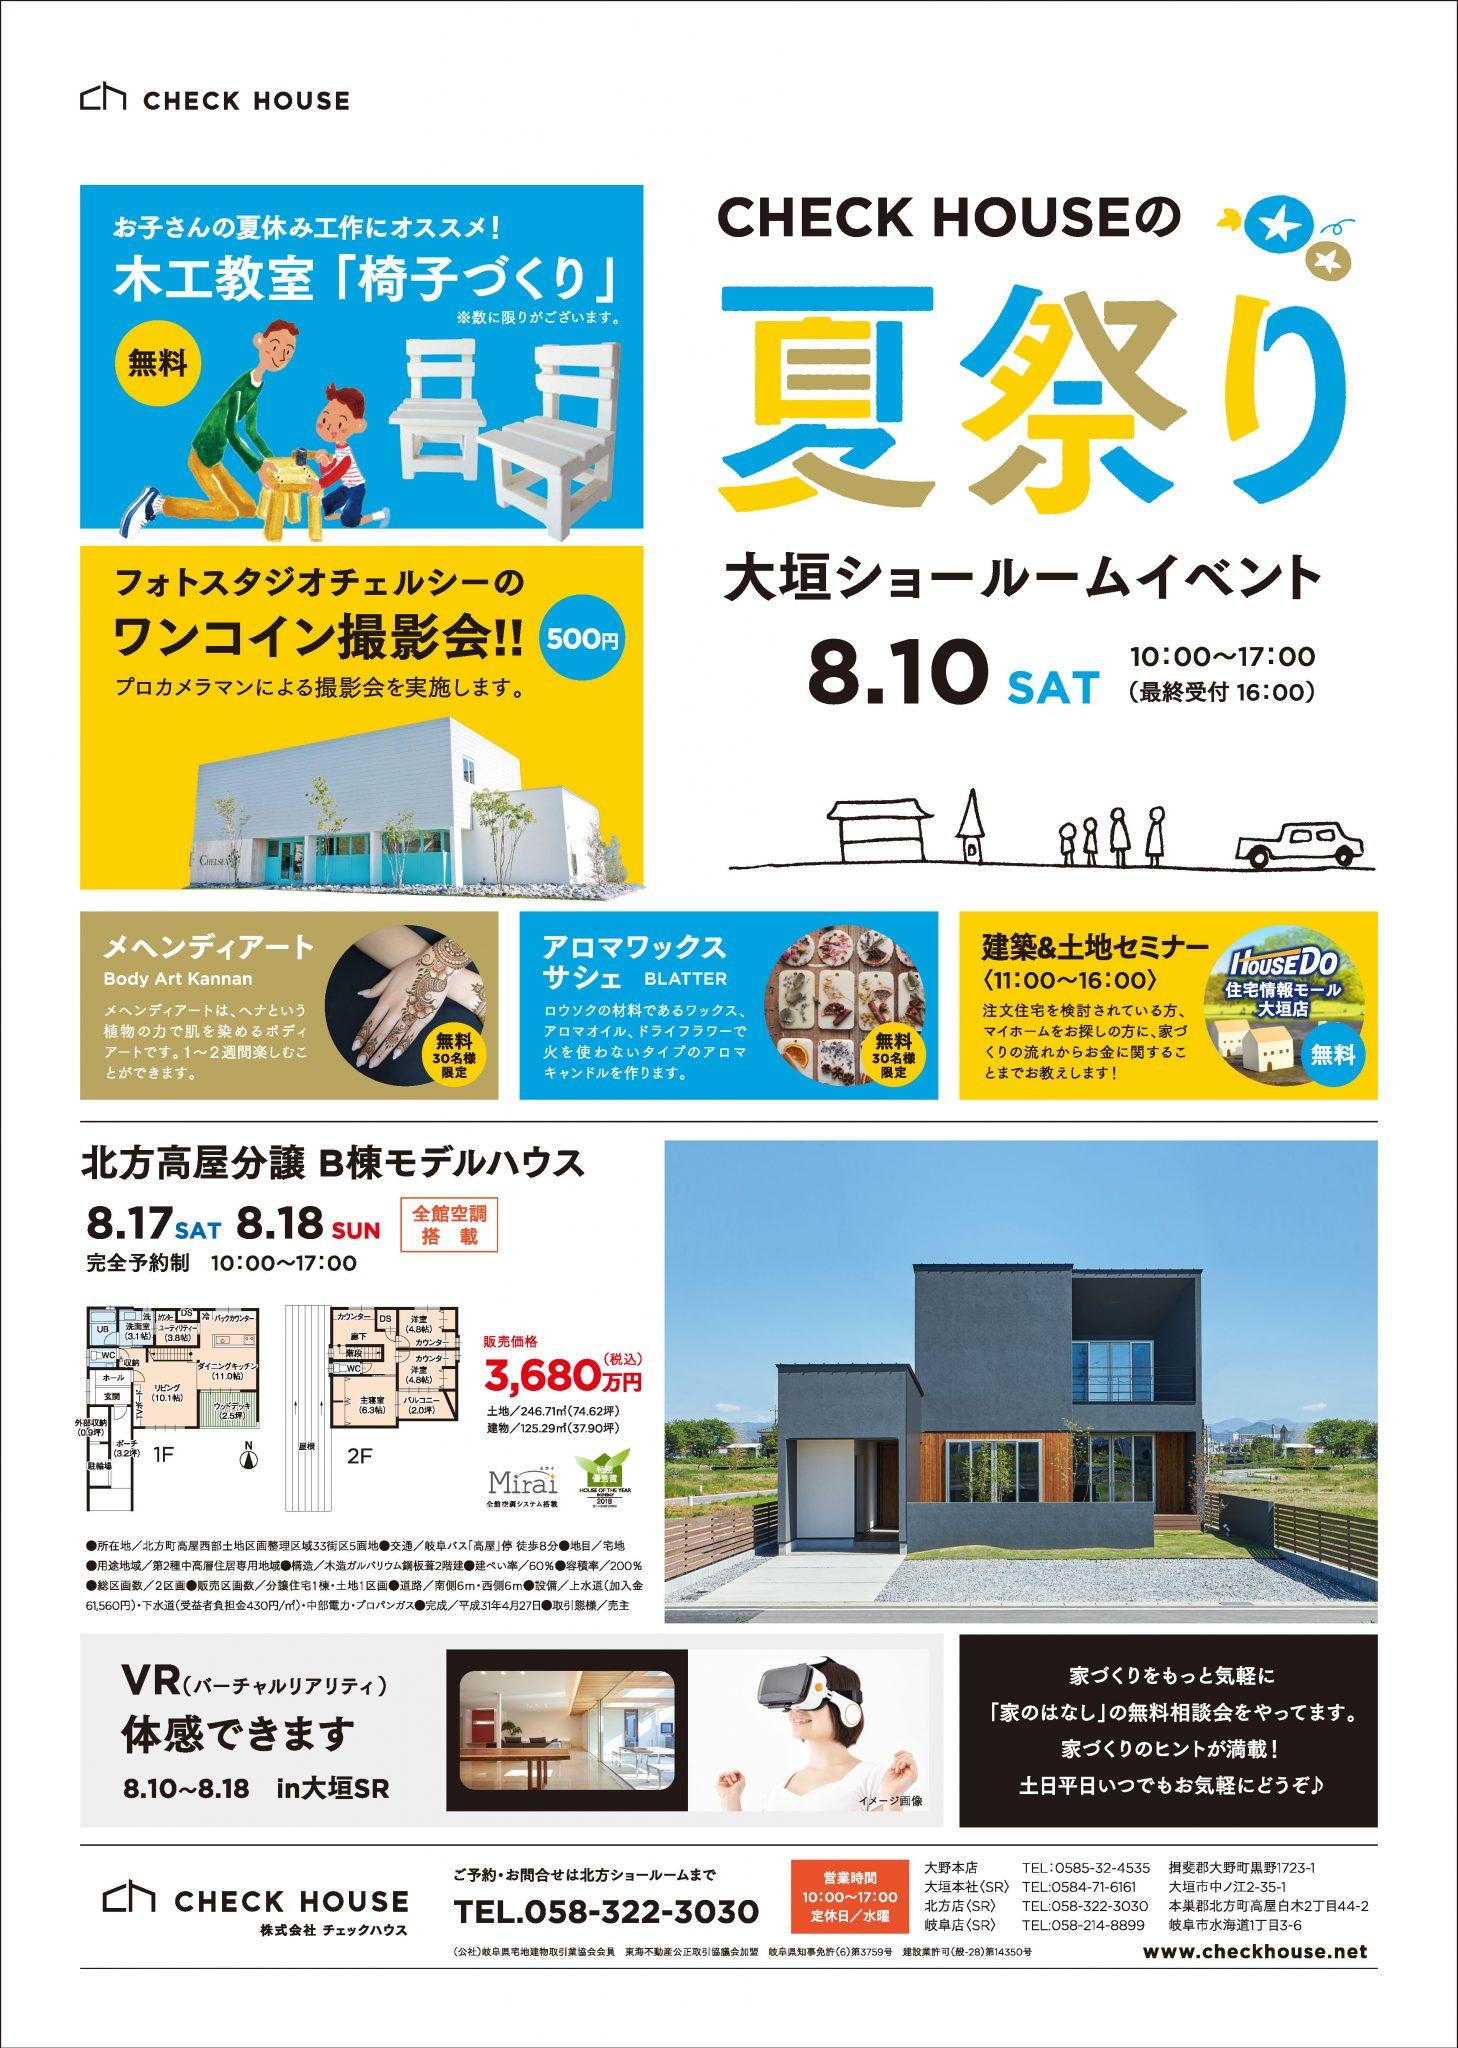 8.10 CHECKHOUSEの夏祭り in 大垣ショールーム